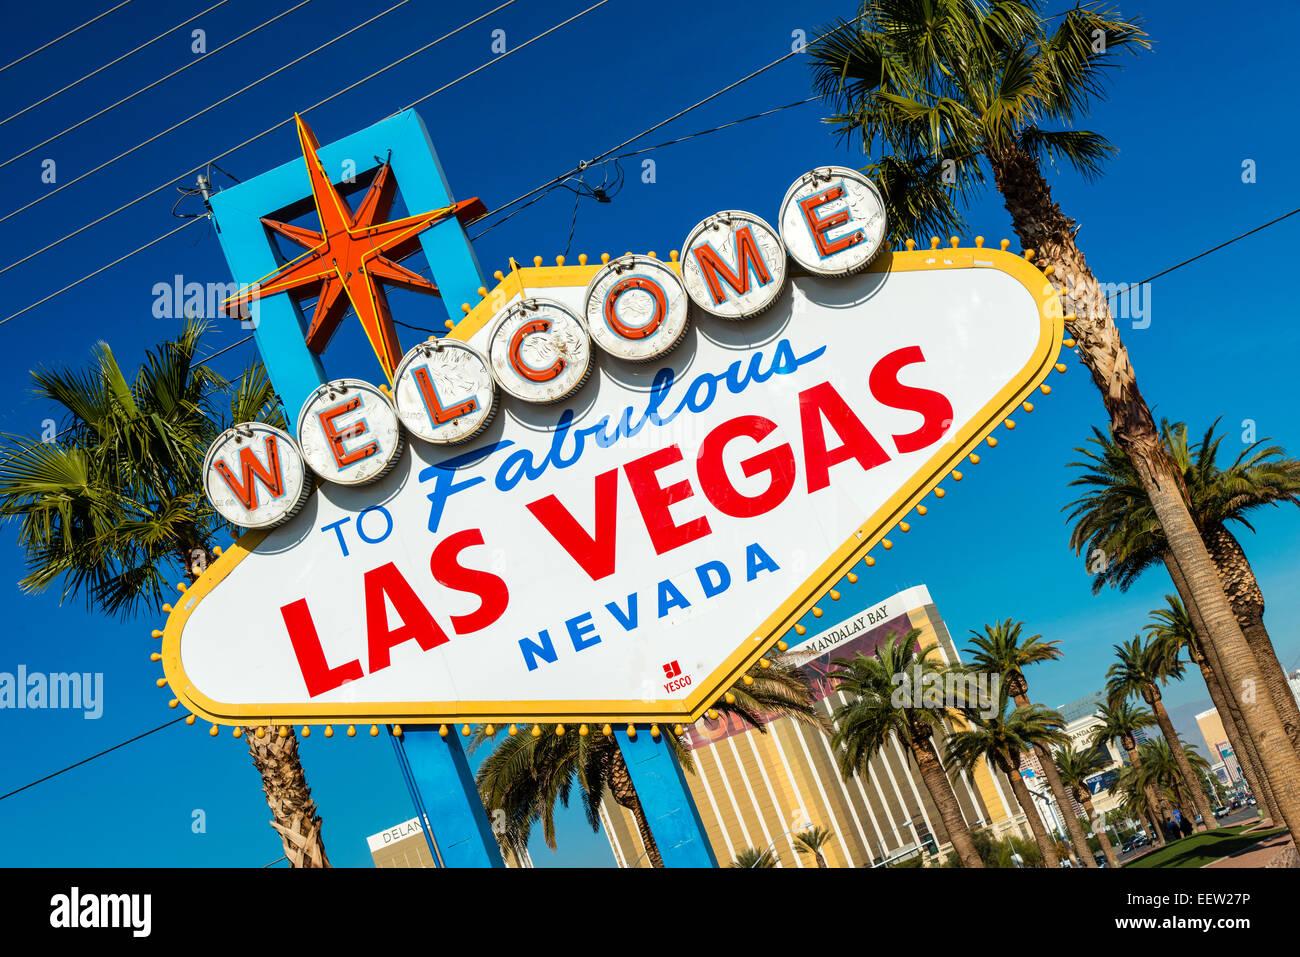 Welcome to Fabulous Las Vegas sign, Las Vegas, Nevada, USA Stock Photo